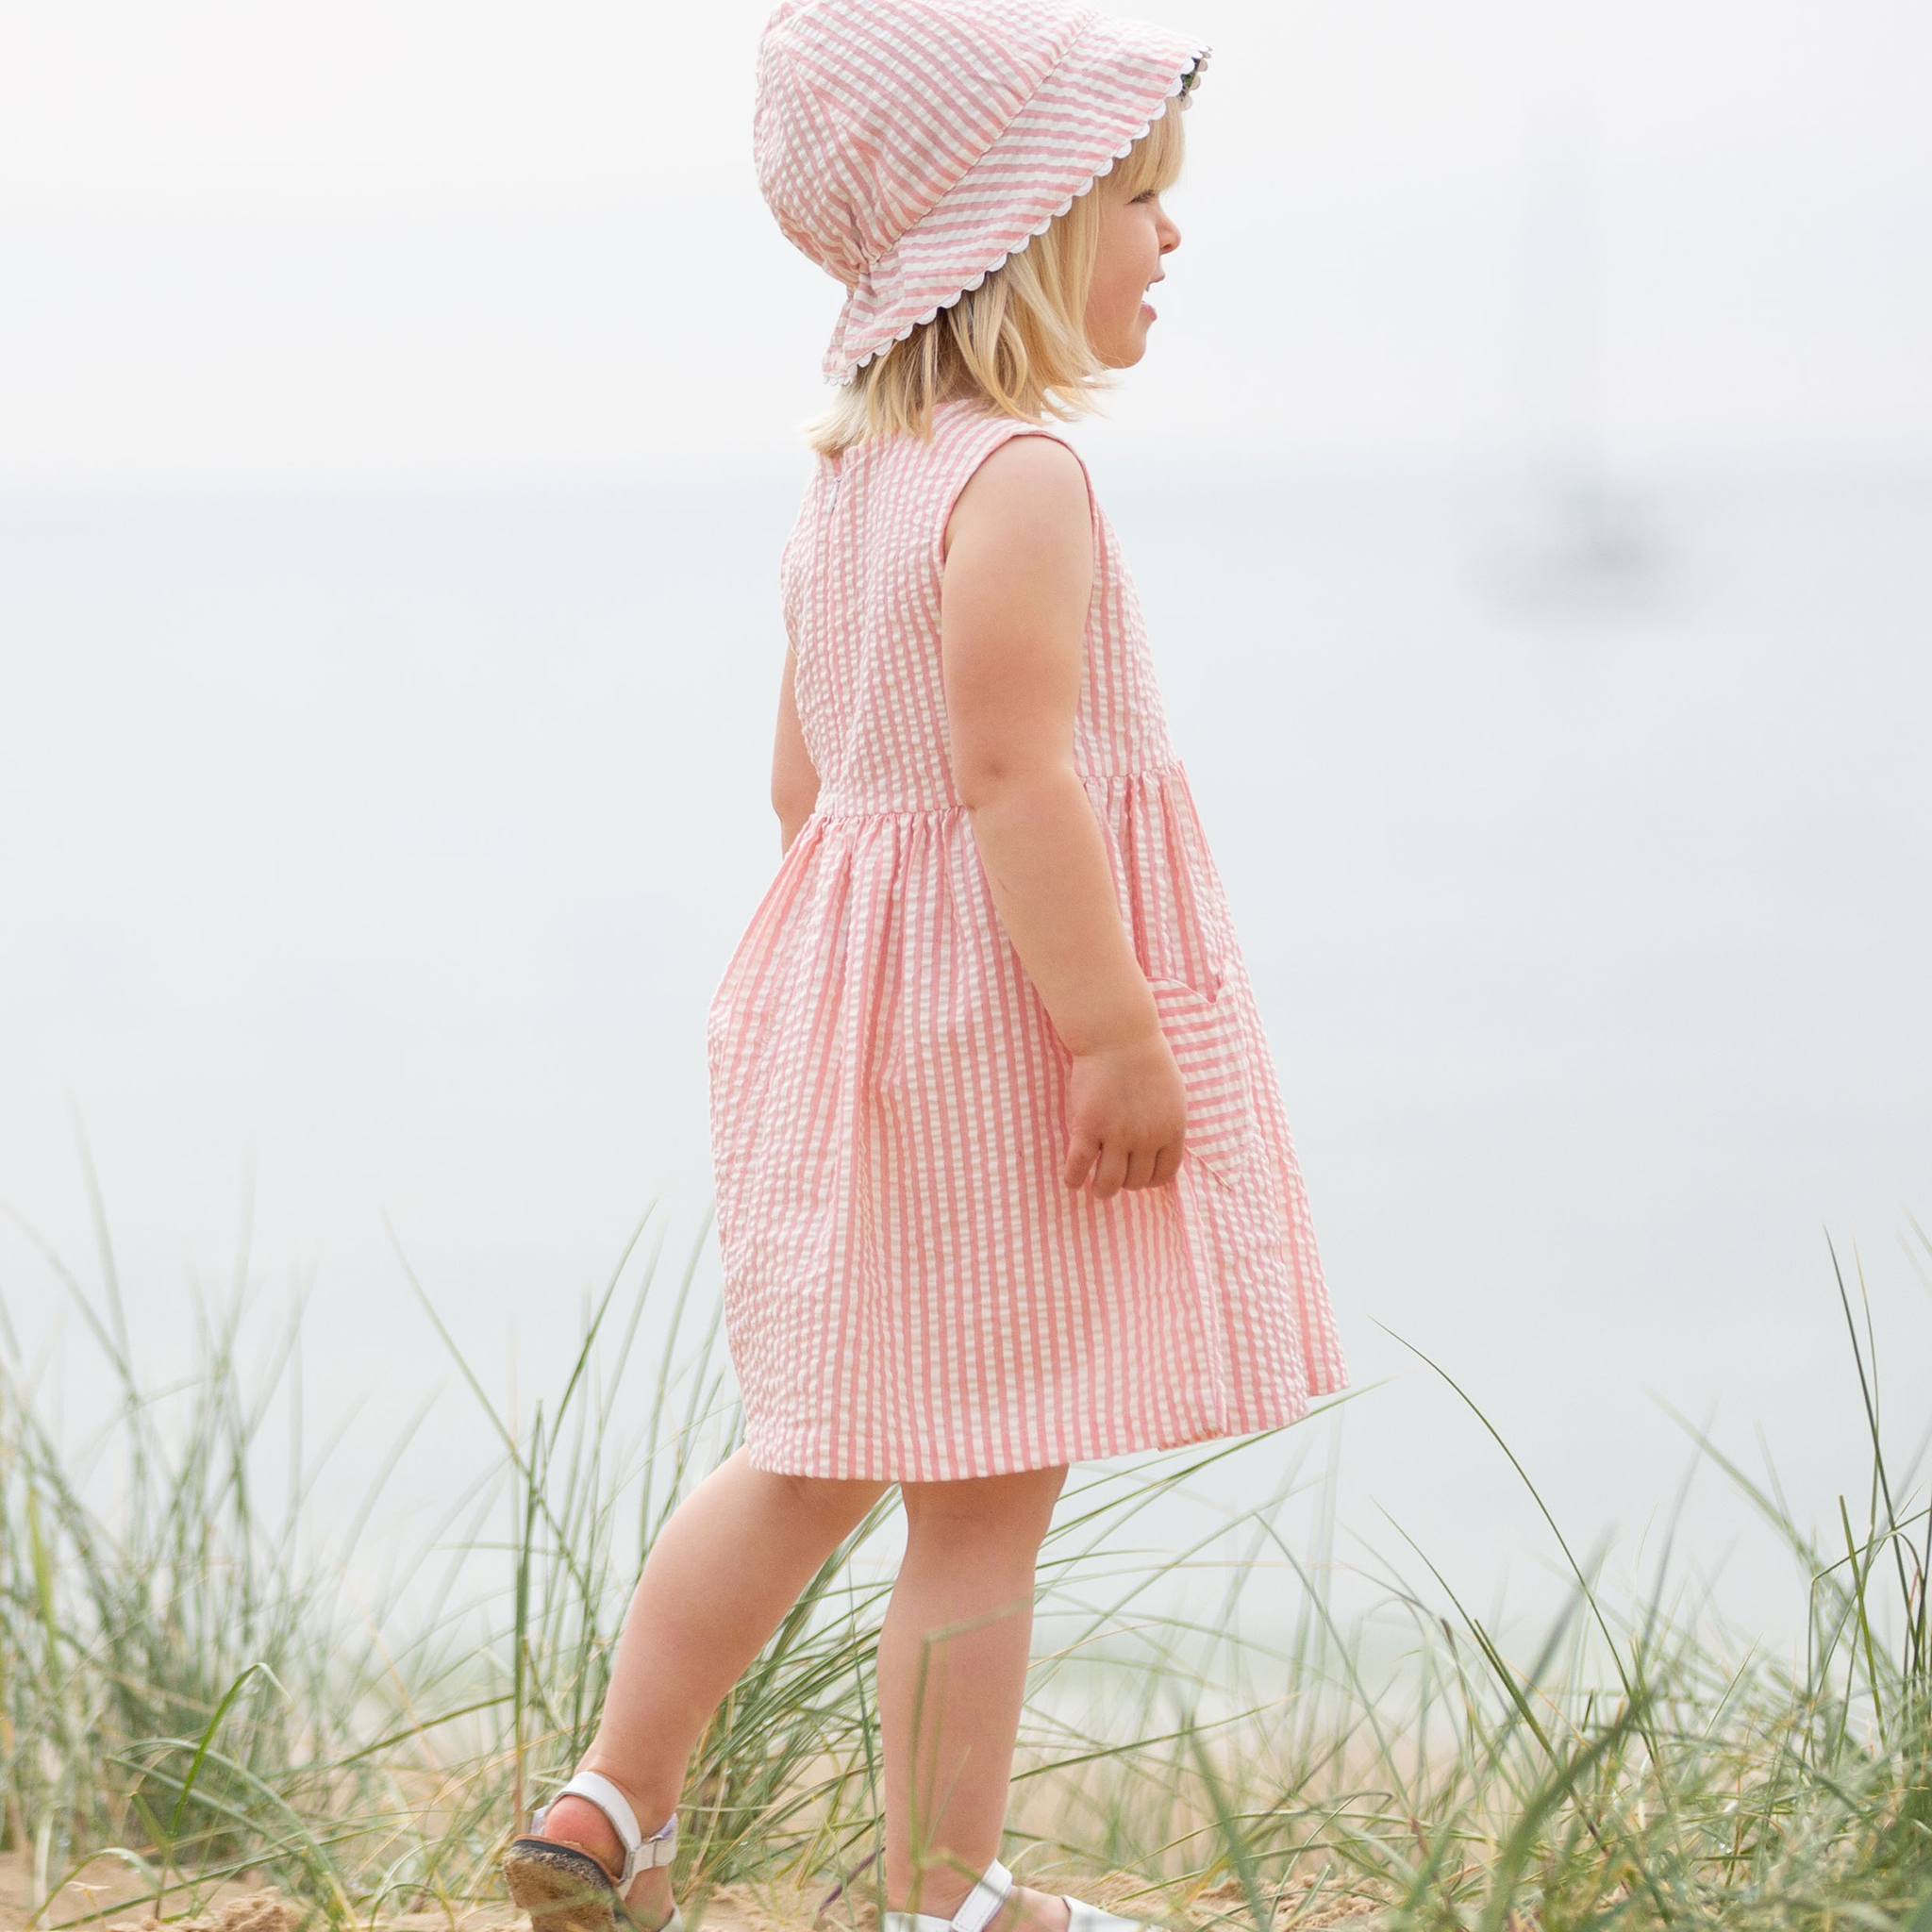 Kite Seersucker Heart Dress